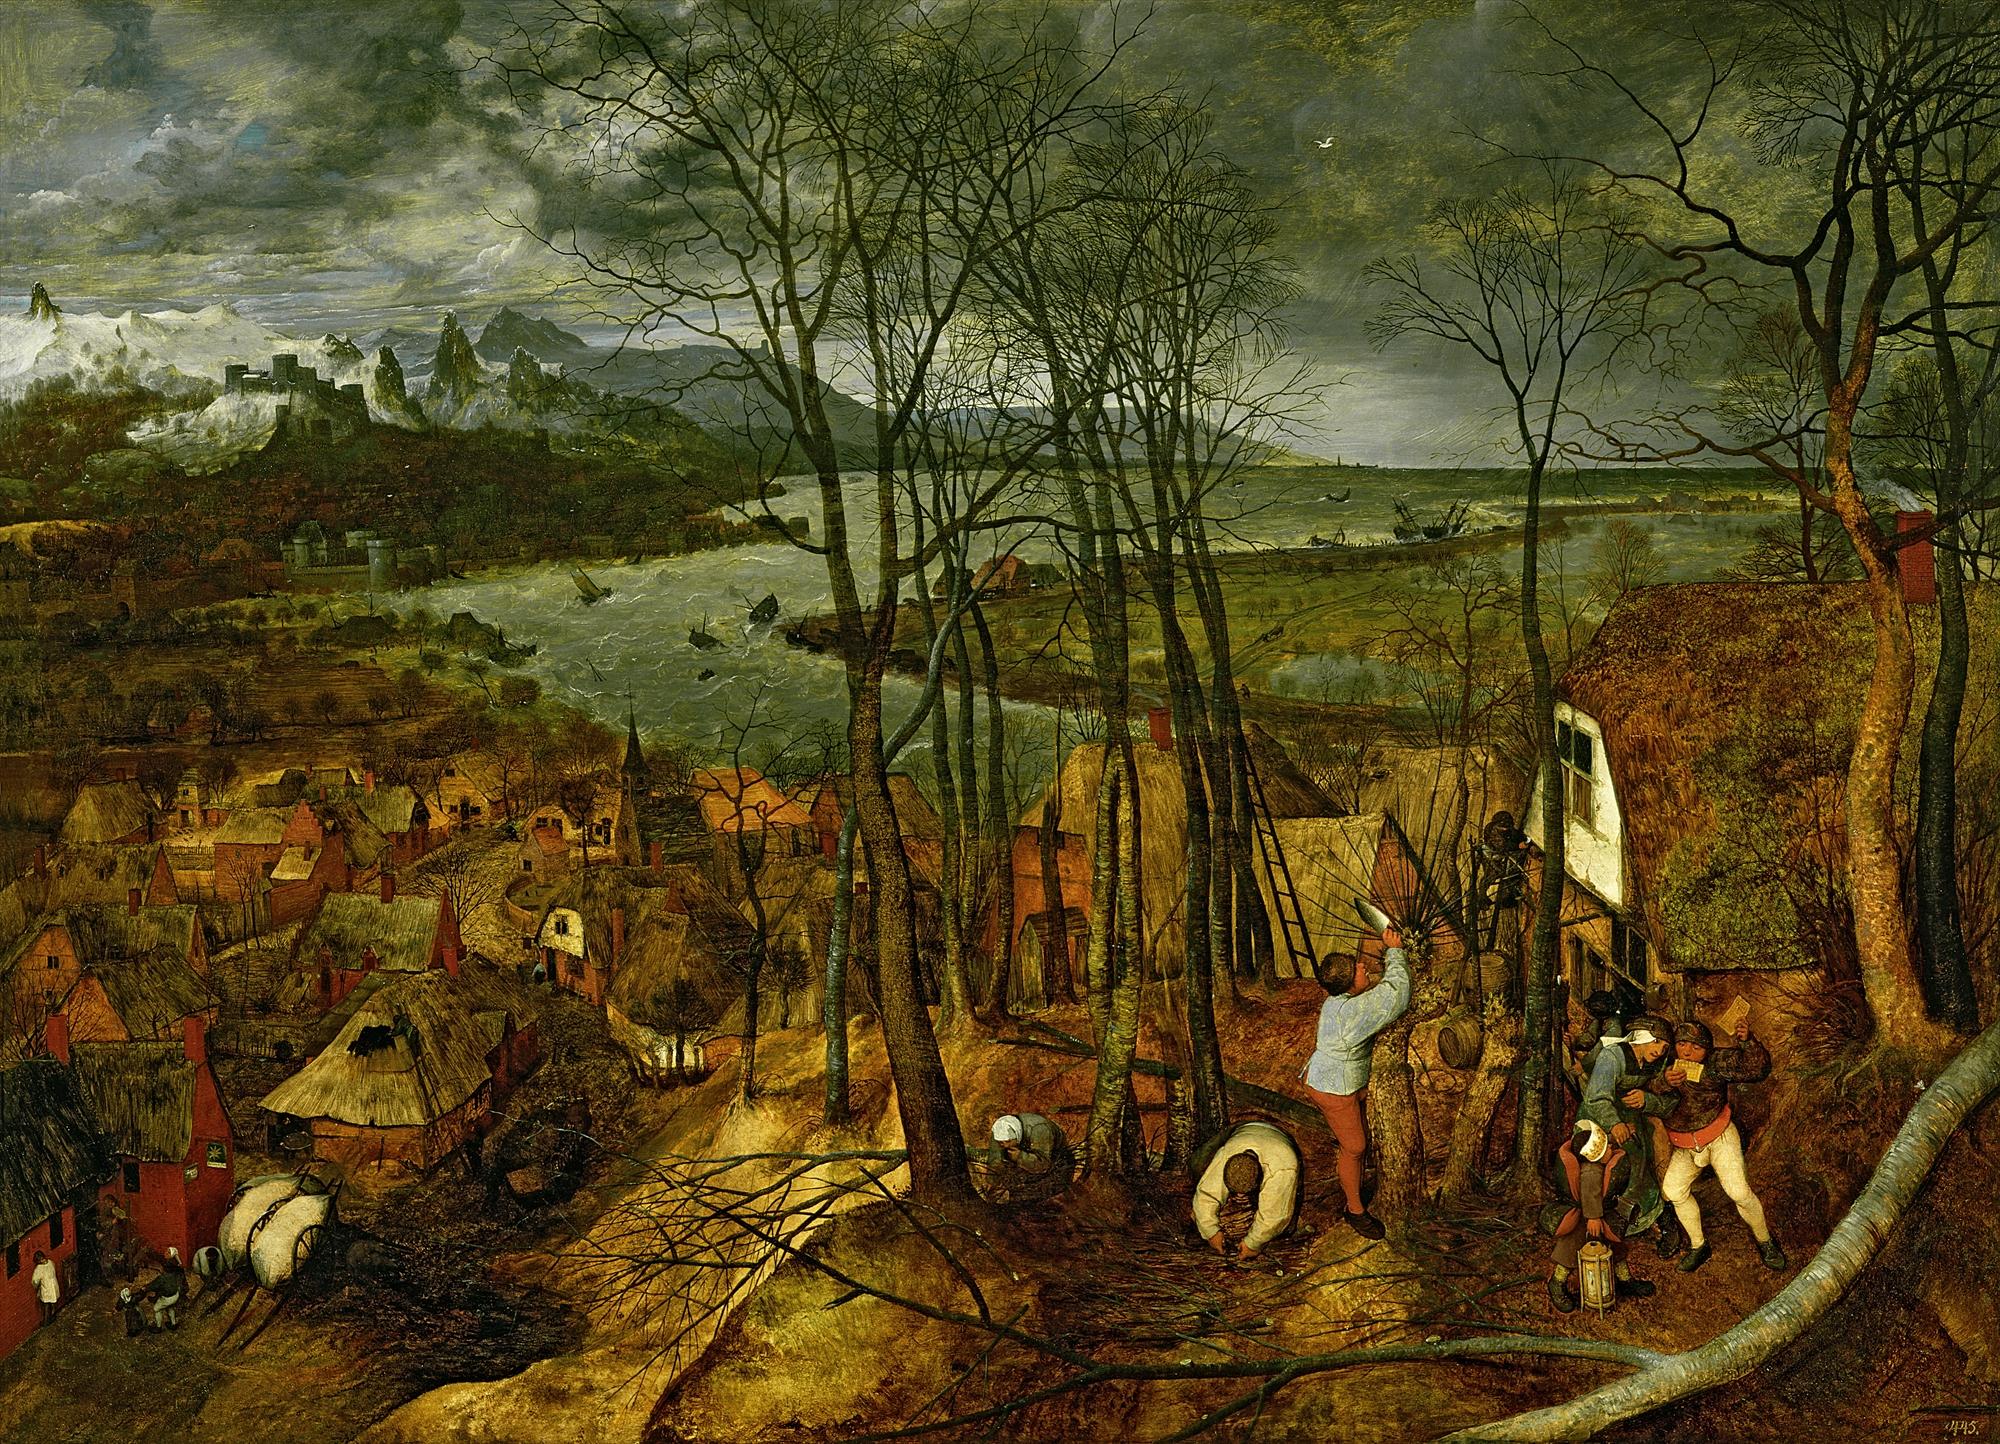 pieter bruegel the elder Pieter bruegel, the elder, byname peasant bruegel, dutch pieter bruegel de oudere or boeren bruegel, bruegel also spelled brueghel or breughel, (born c 1525.